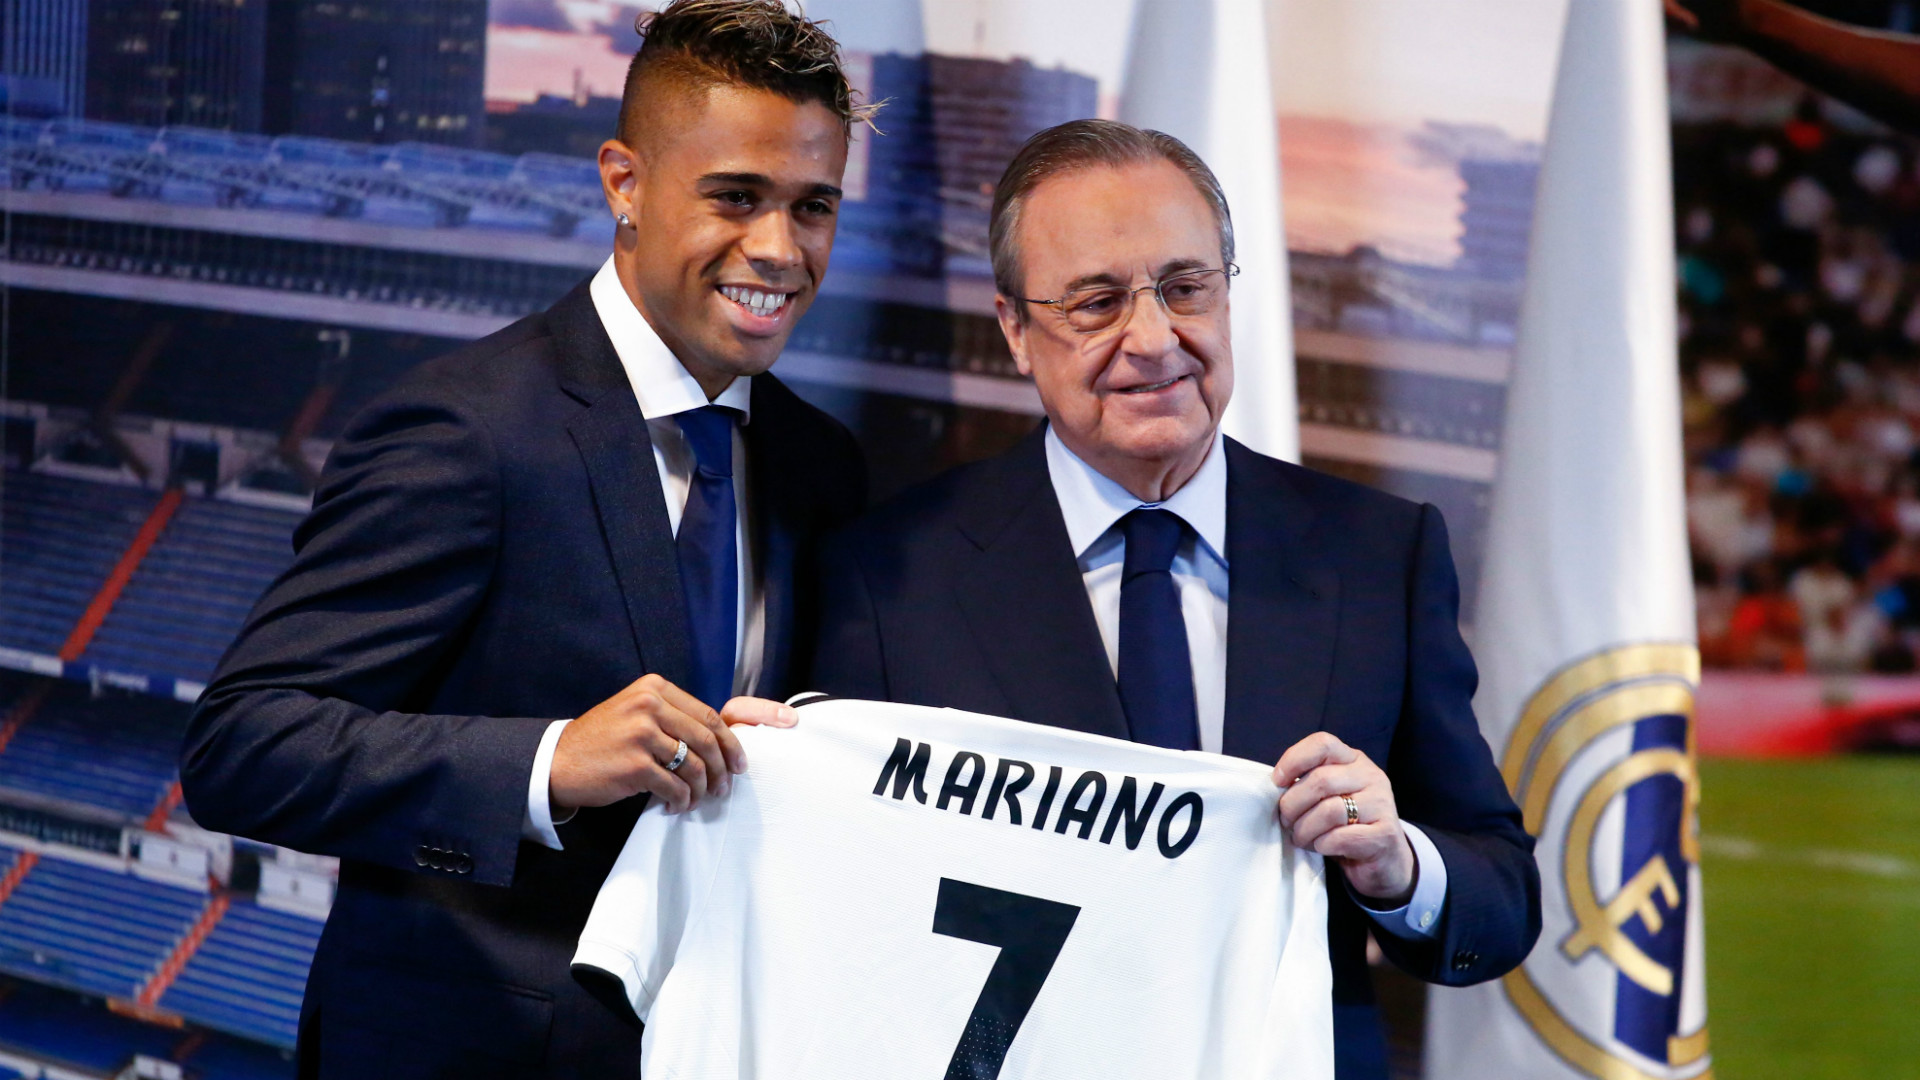 Mariano Diaz Florentino Perez Real Madrid unveiling